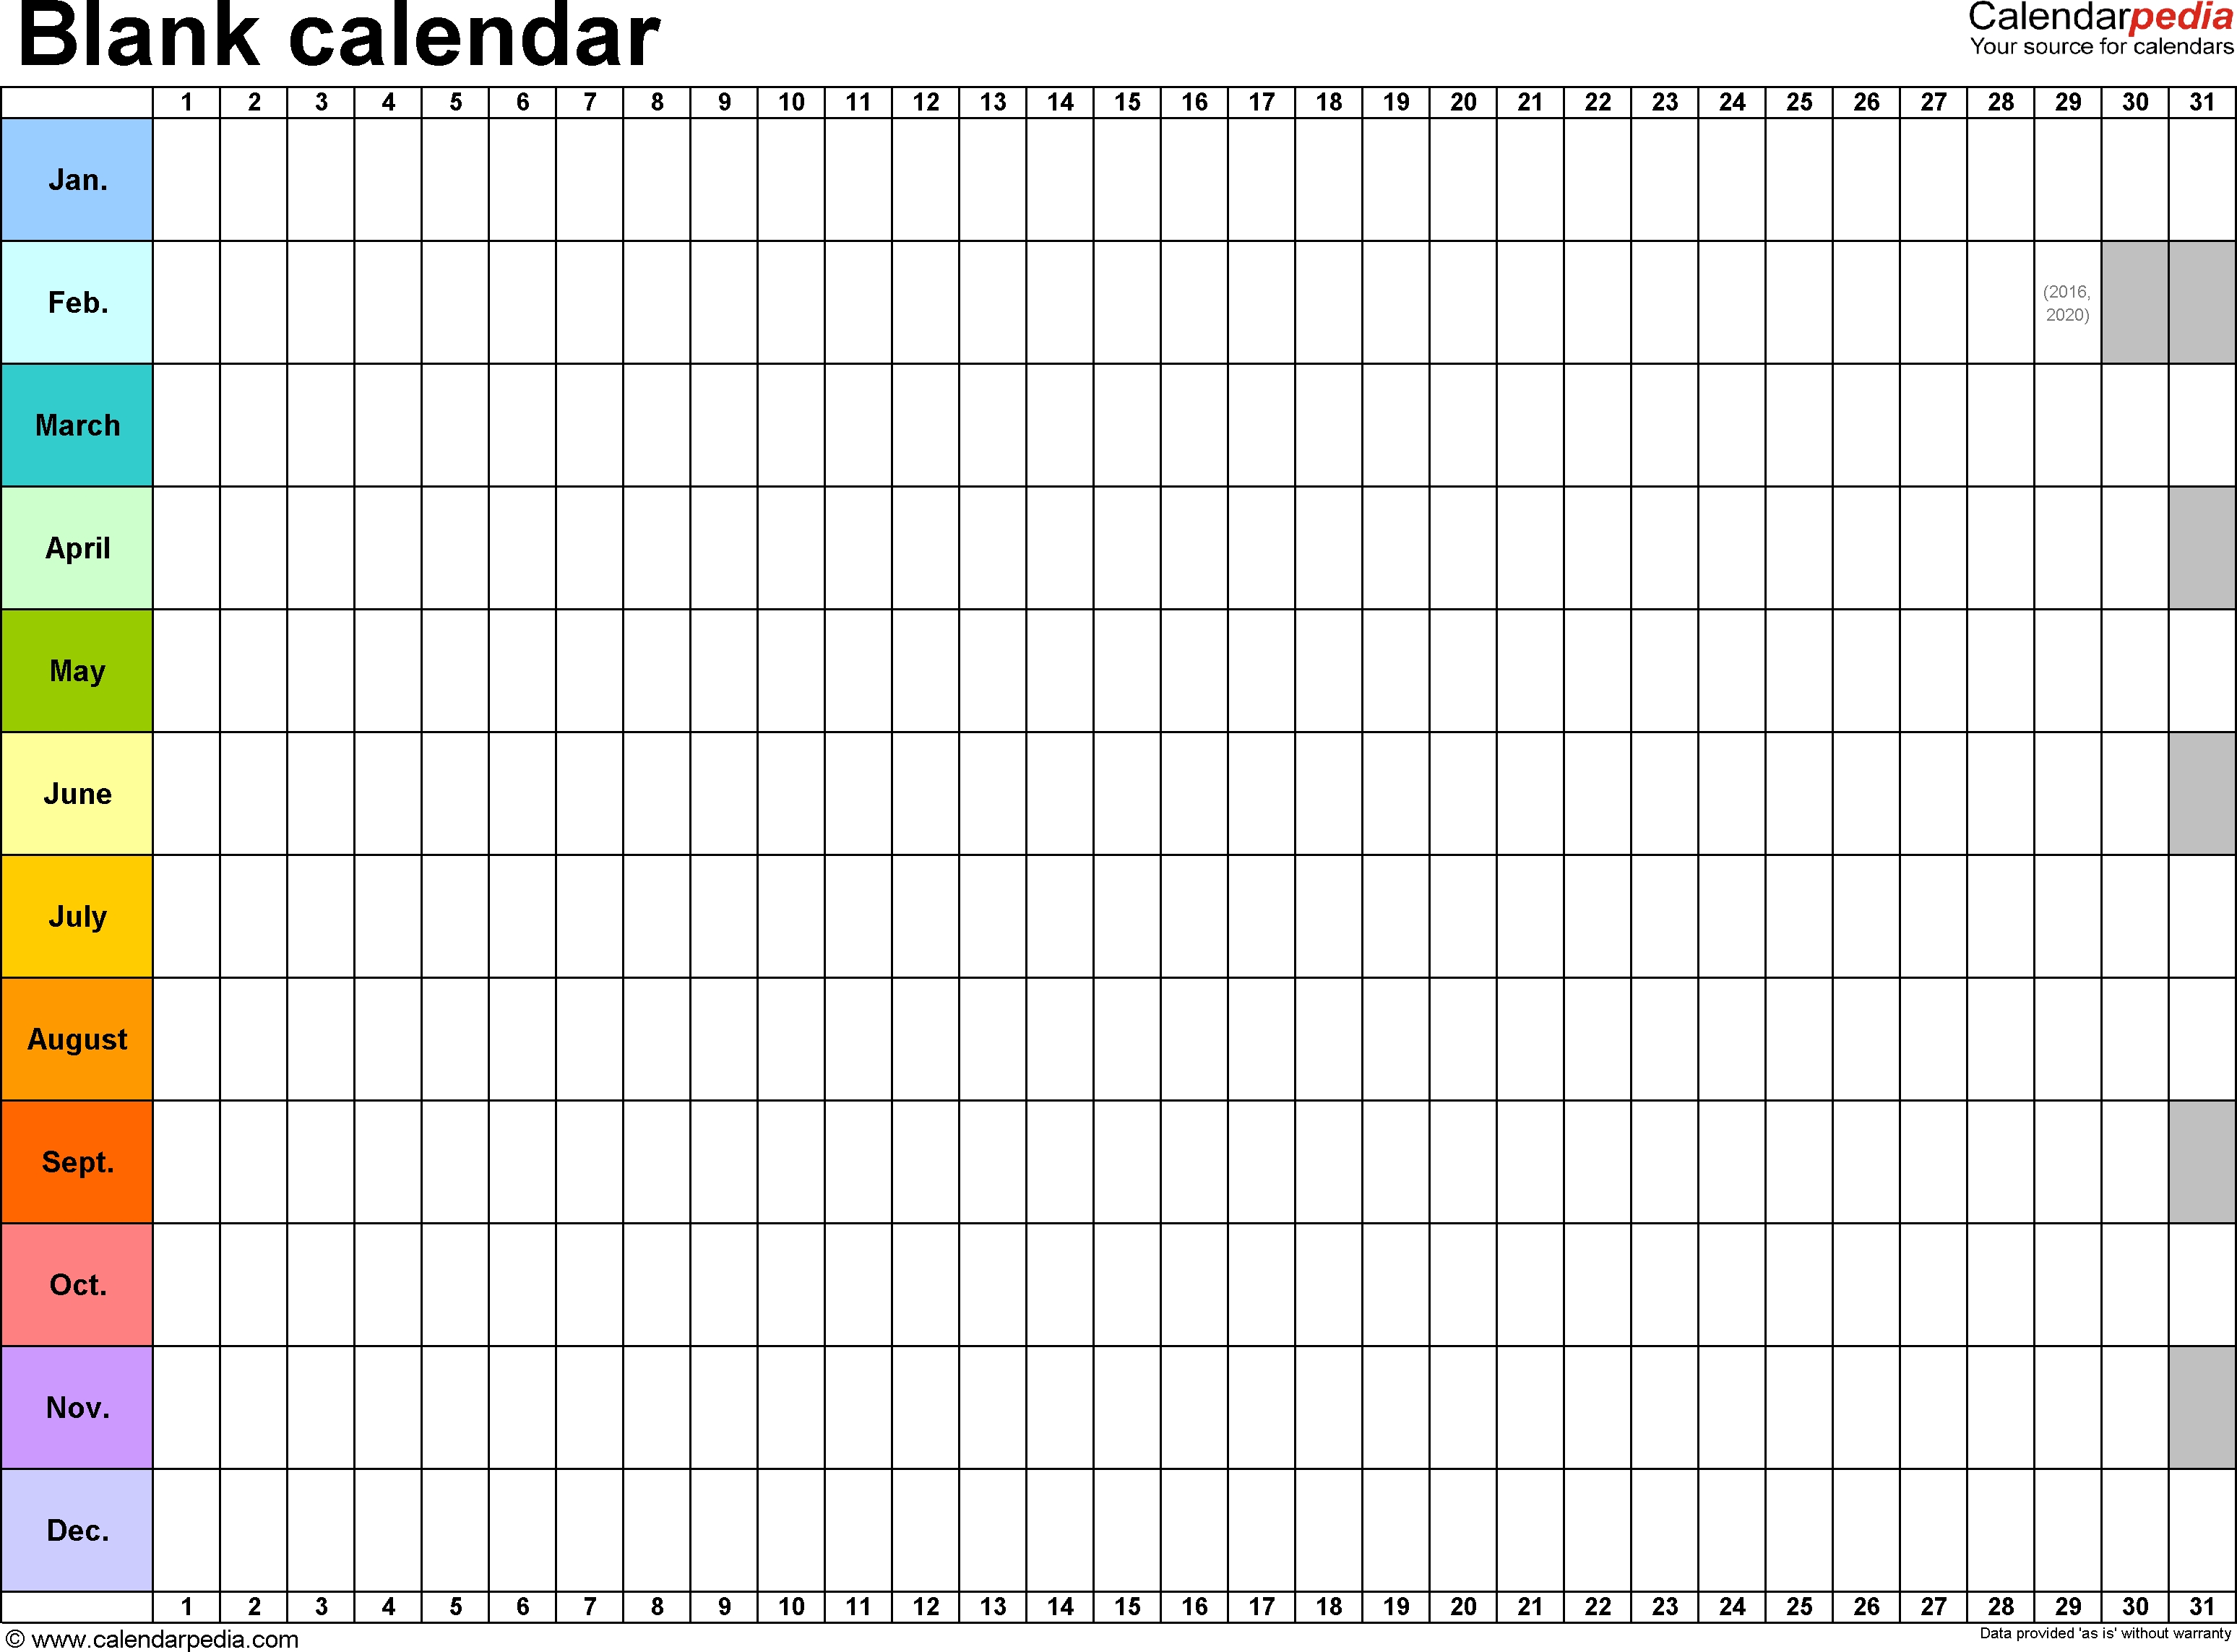 Blank Calendar - 9 Free Printable Microsoft Word Templates regarding Blank Calendar For A Month